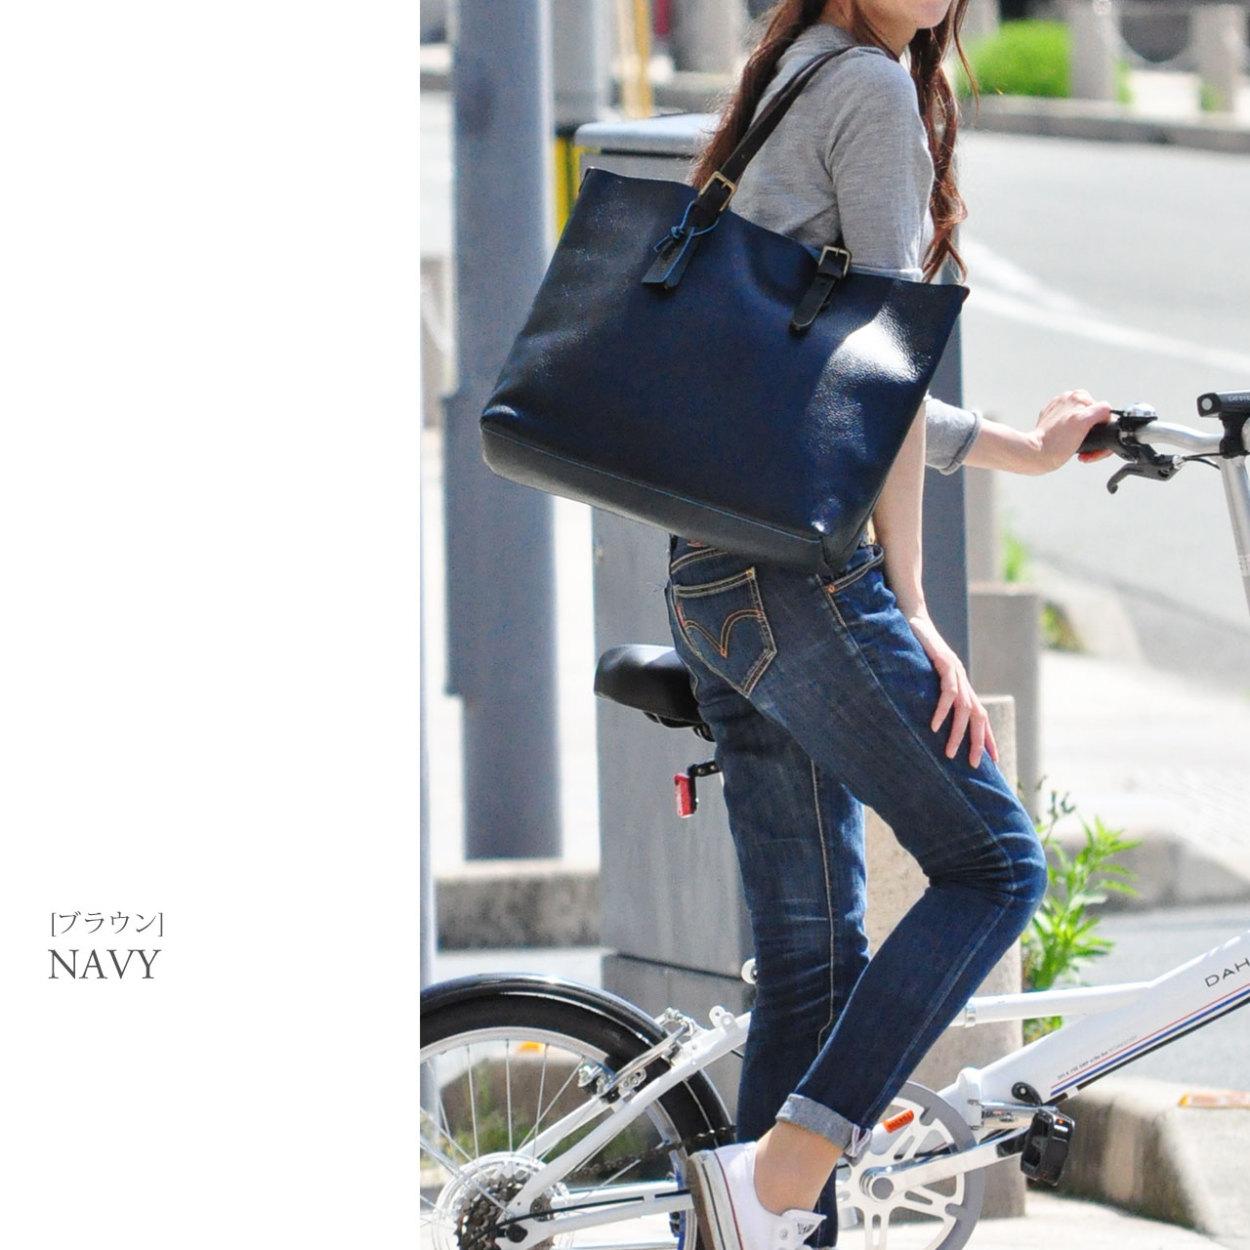 [HALEINE] 牛革 バッグ 切りっぱなし ネイビー オレンジ